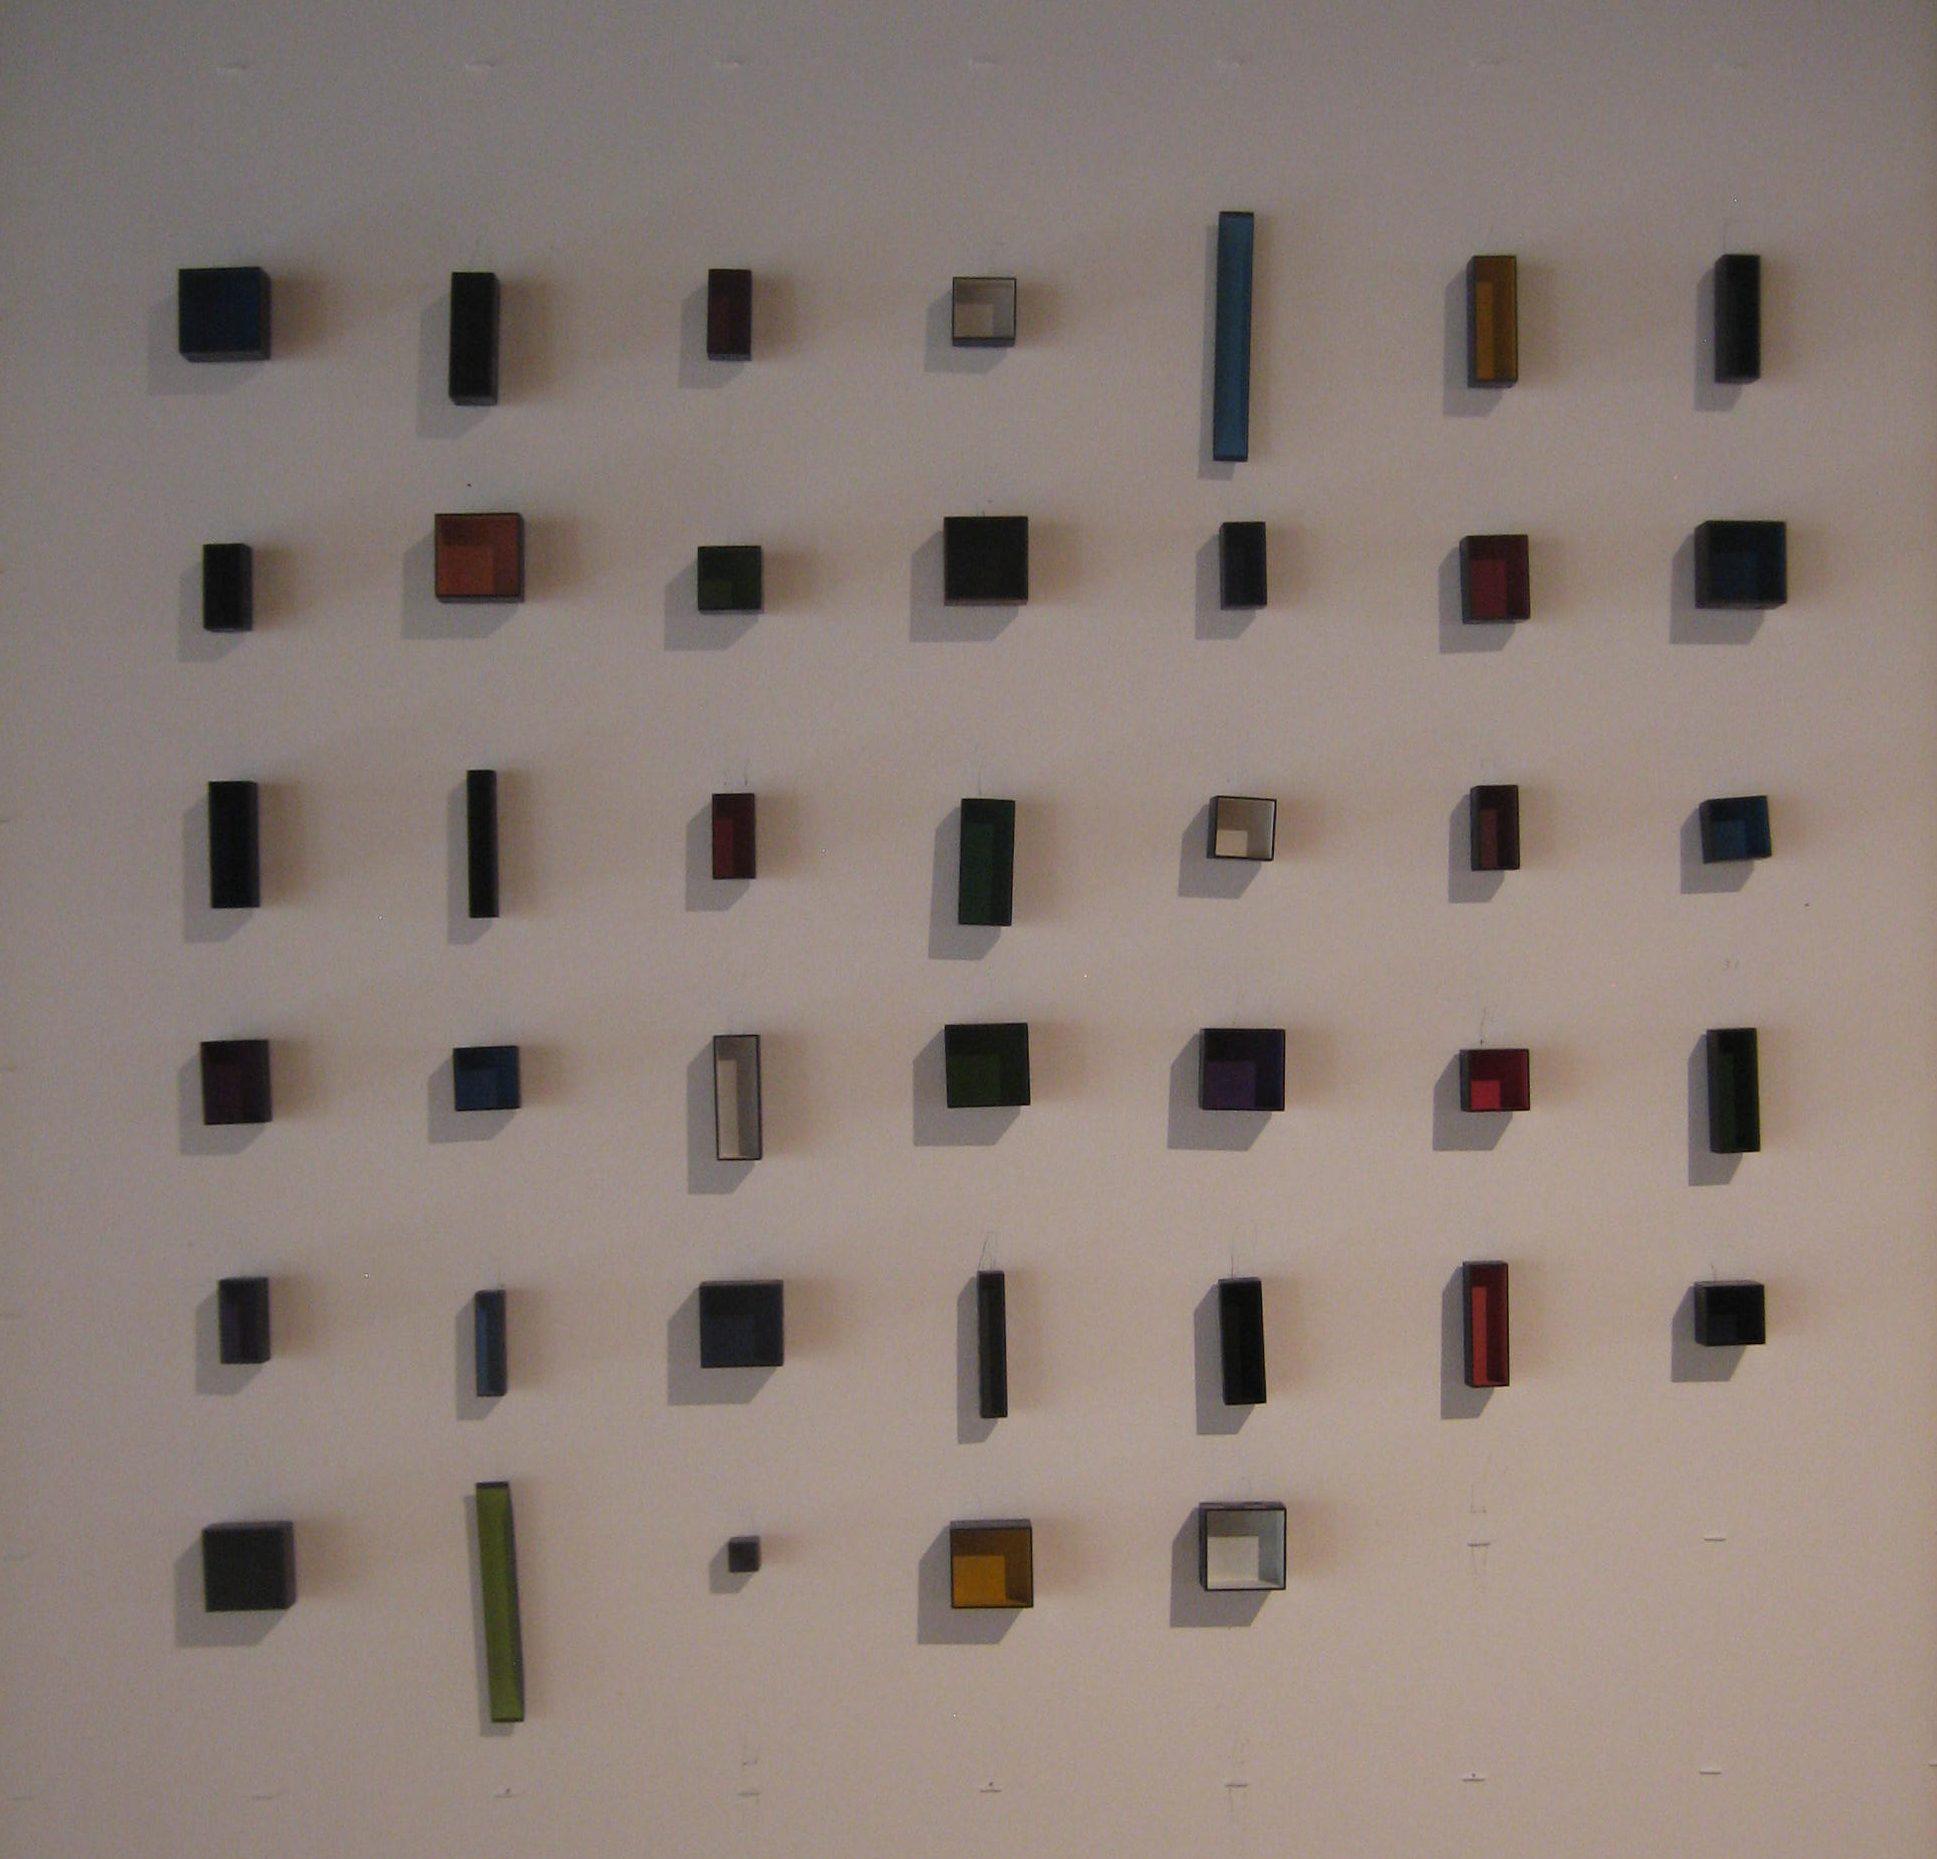 Tore Svensson, Box, broches, 2009, Galerie Marzee, 2018. Foto Esther Doornbusch, juli 2018, CC BY 4.0